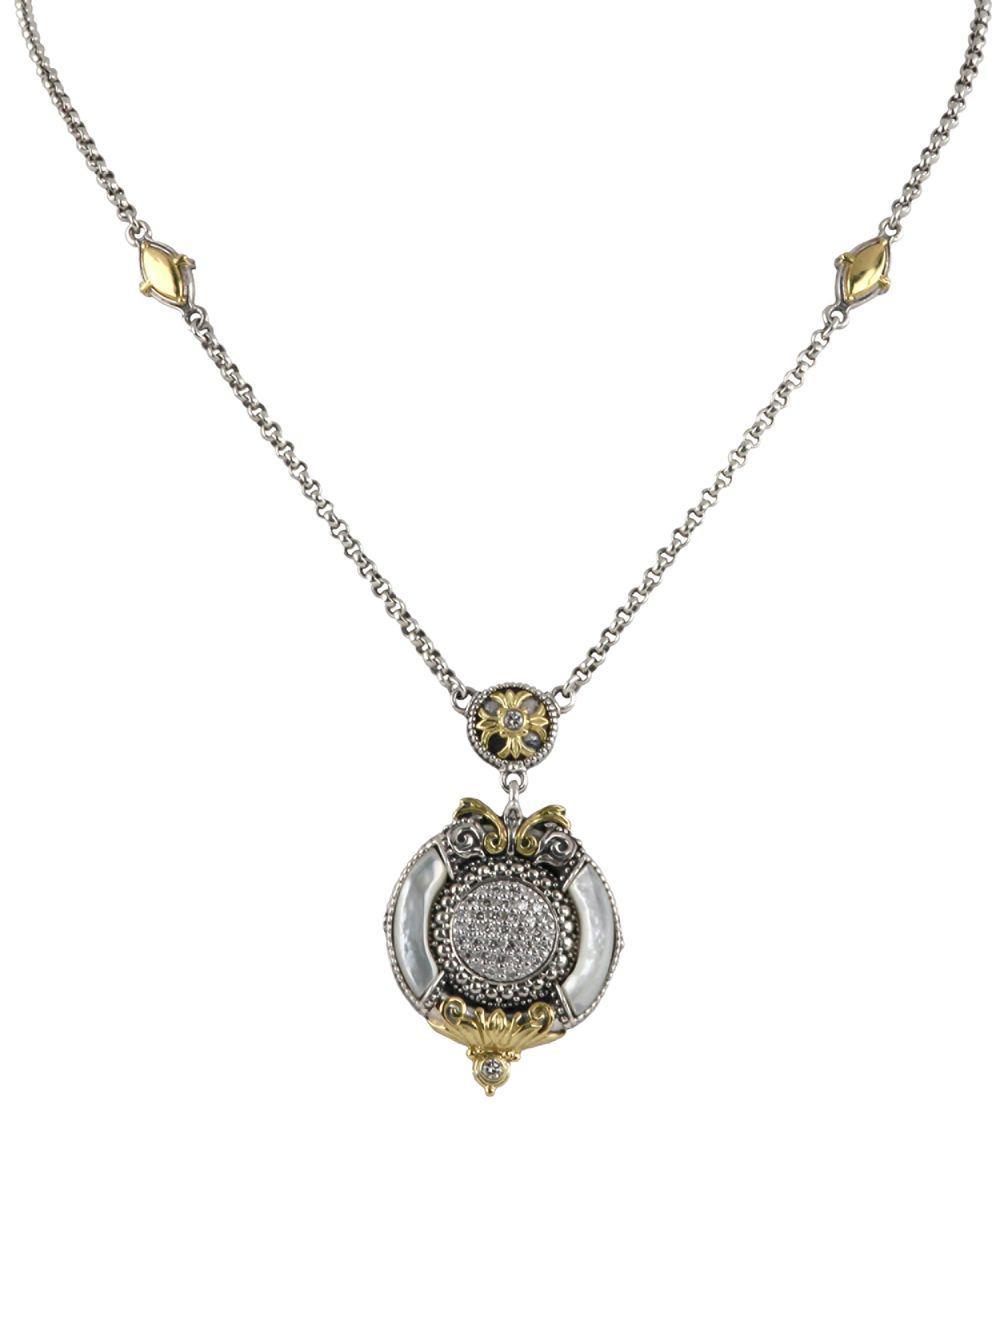 Konstantino Asteri Ornate Round Pendant w/ Pave White Diamonds & Mother-of-Pearl Inlay 8xCdk3